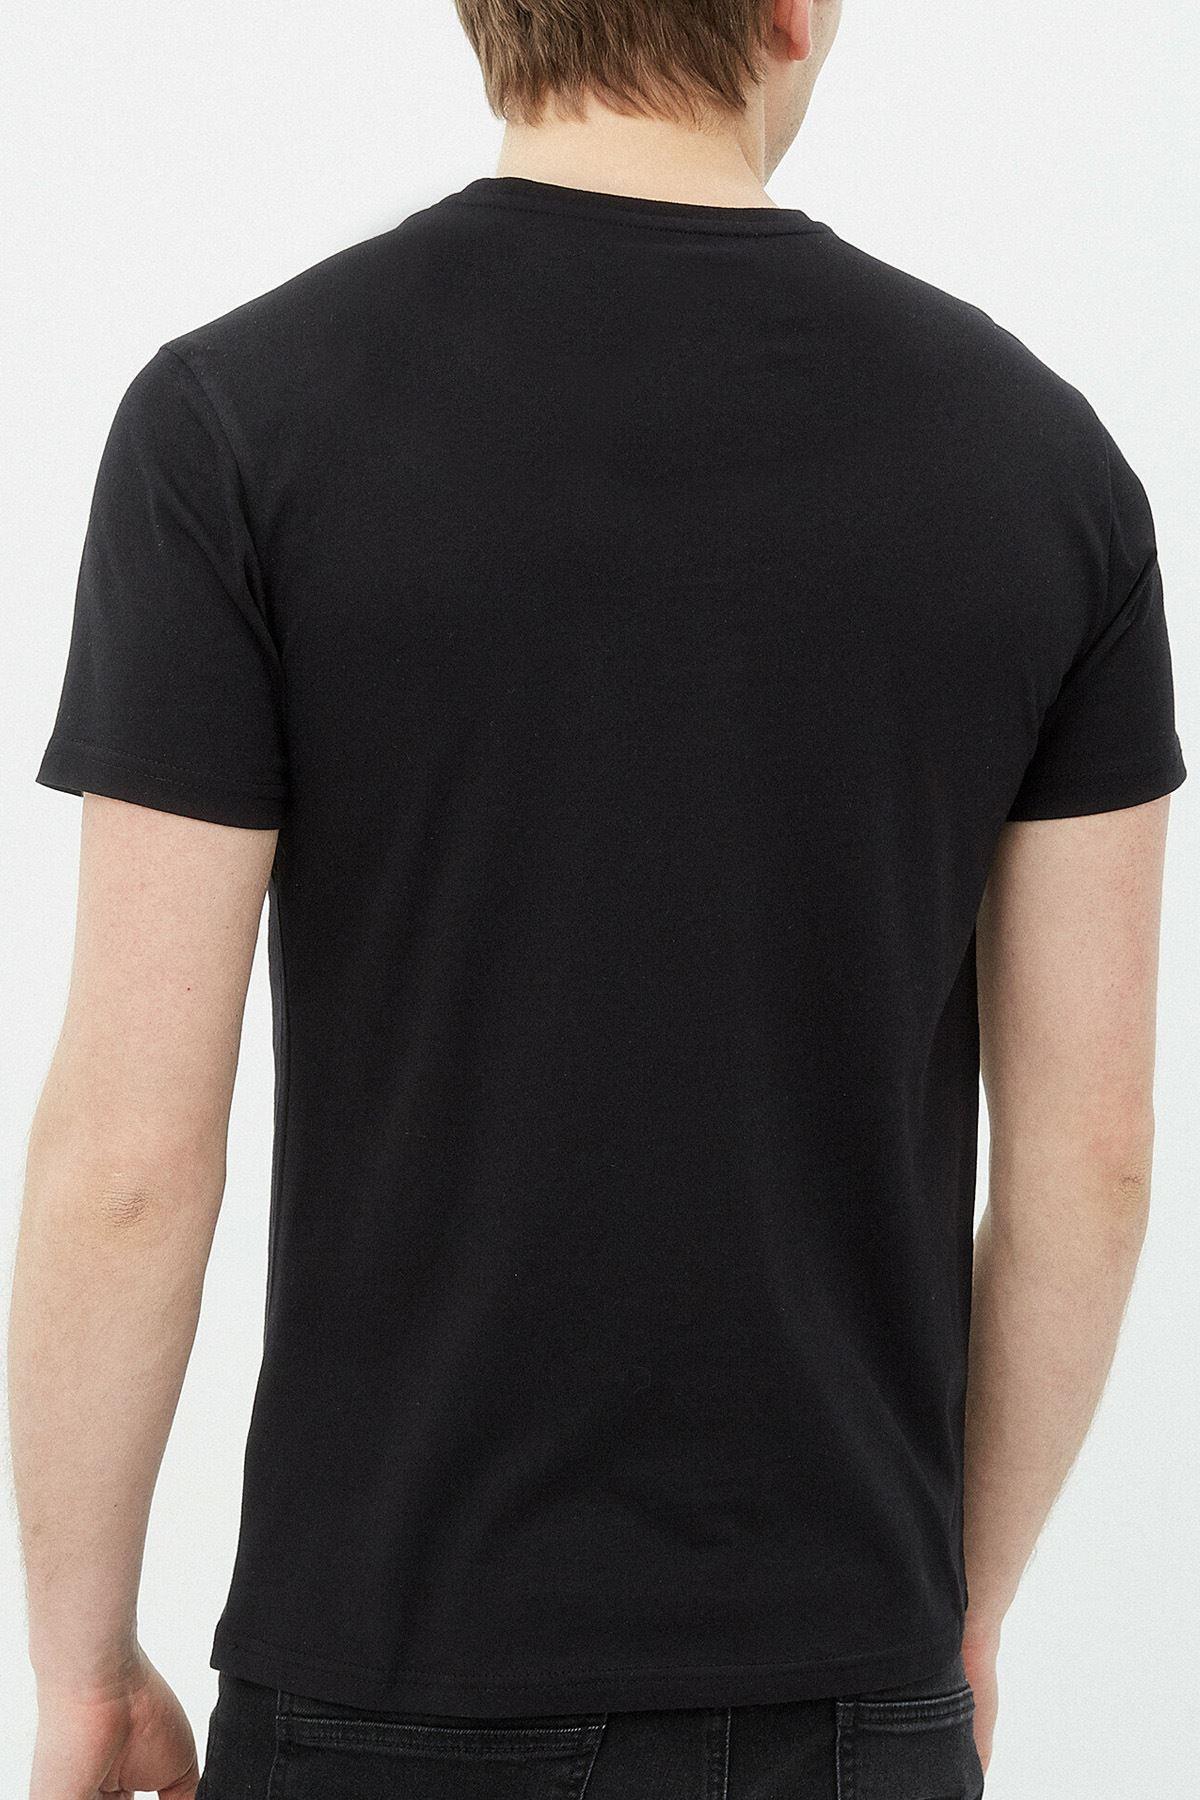 Naruto Anime 02 Siyah Erkek Tshirt - Tişört